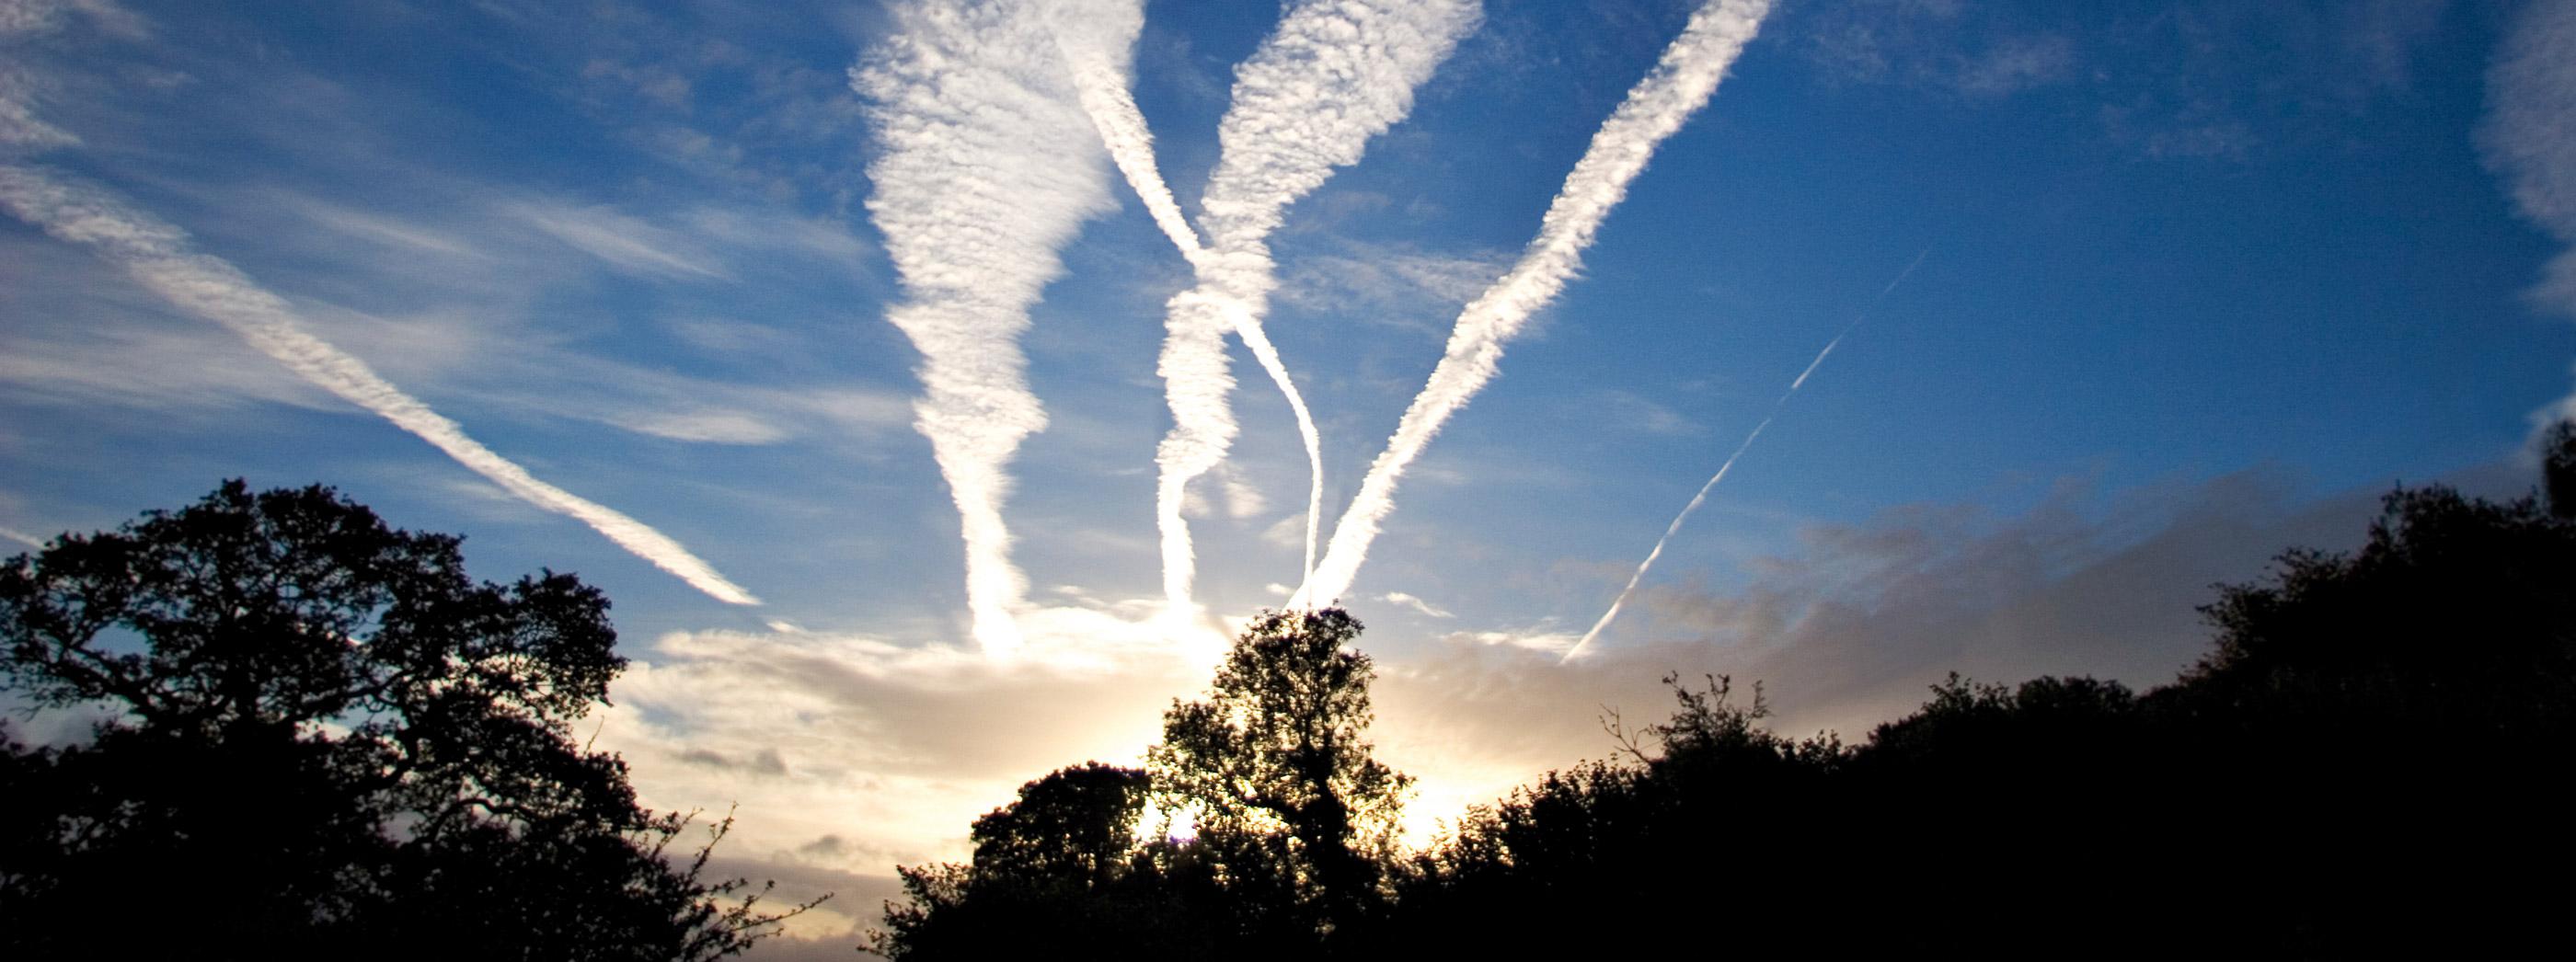 jet trails against a blue sky